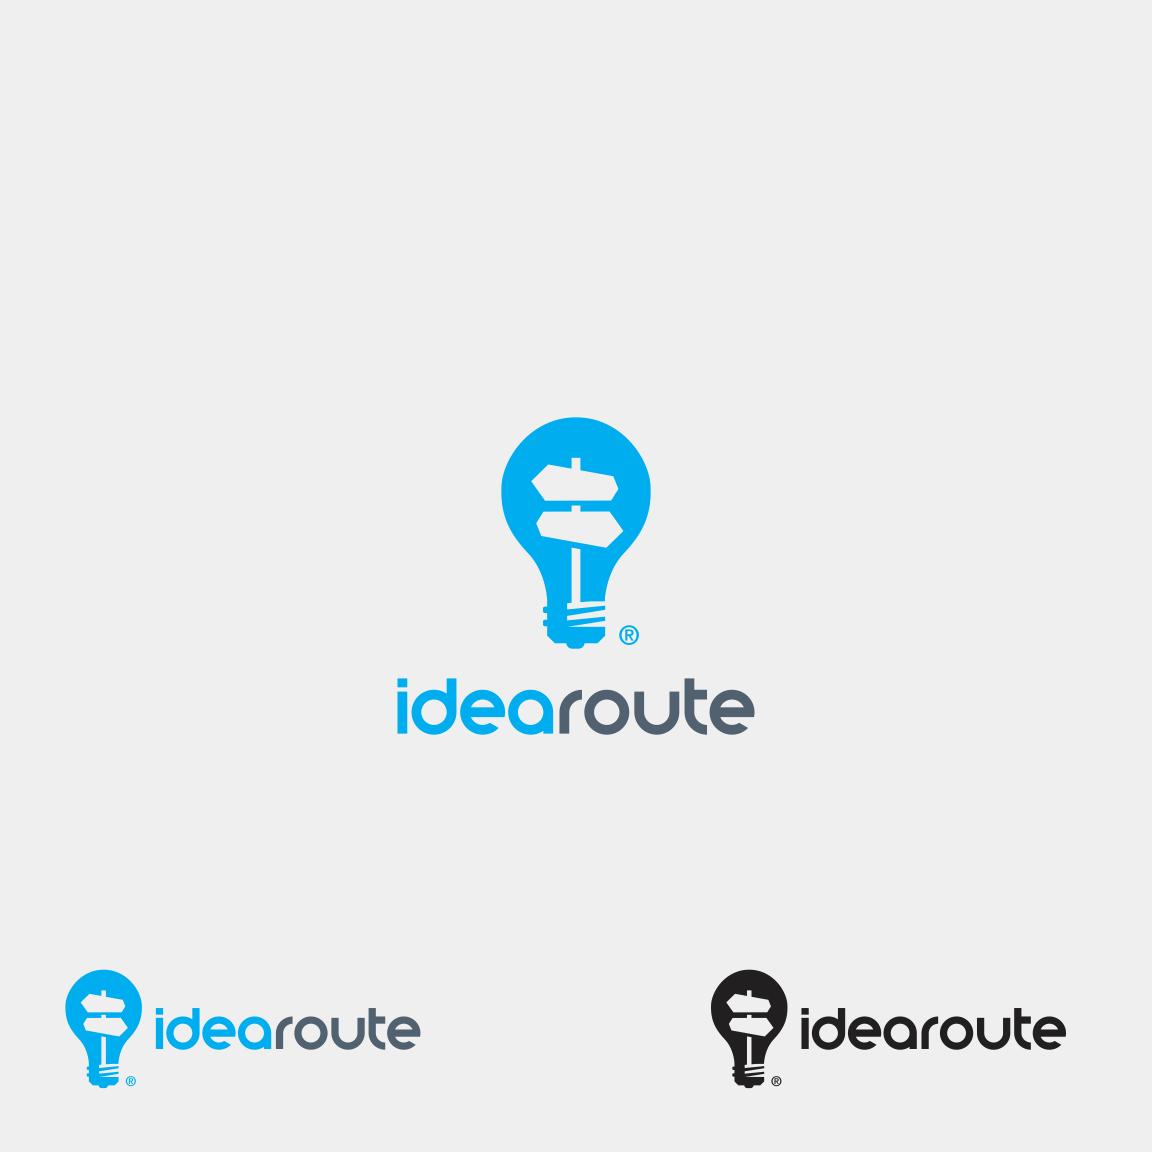 idearoute logo